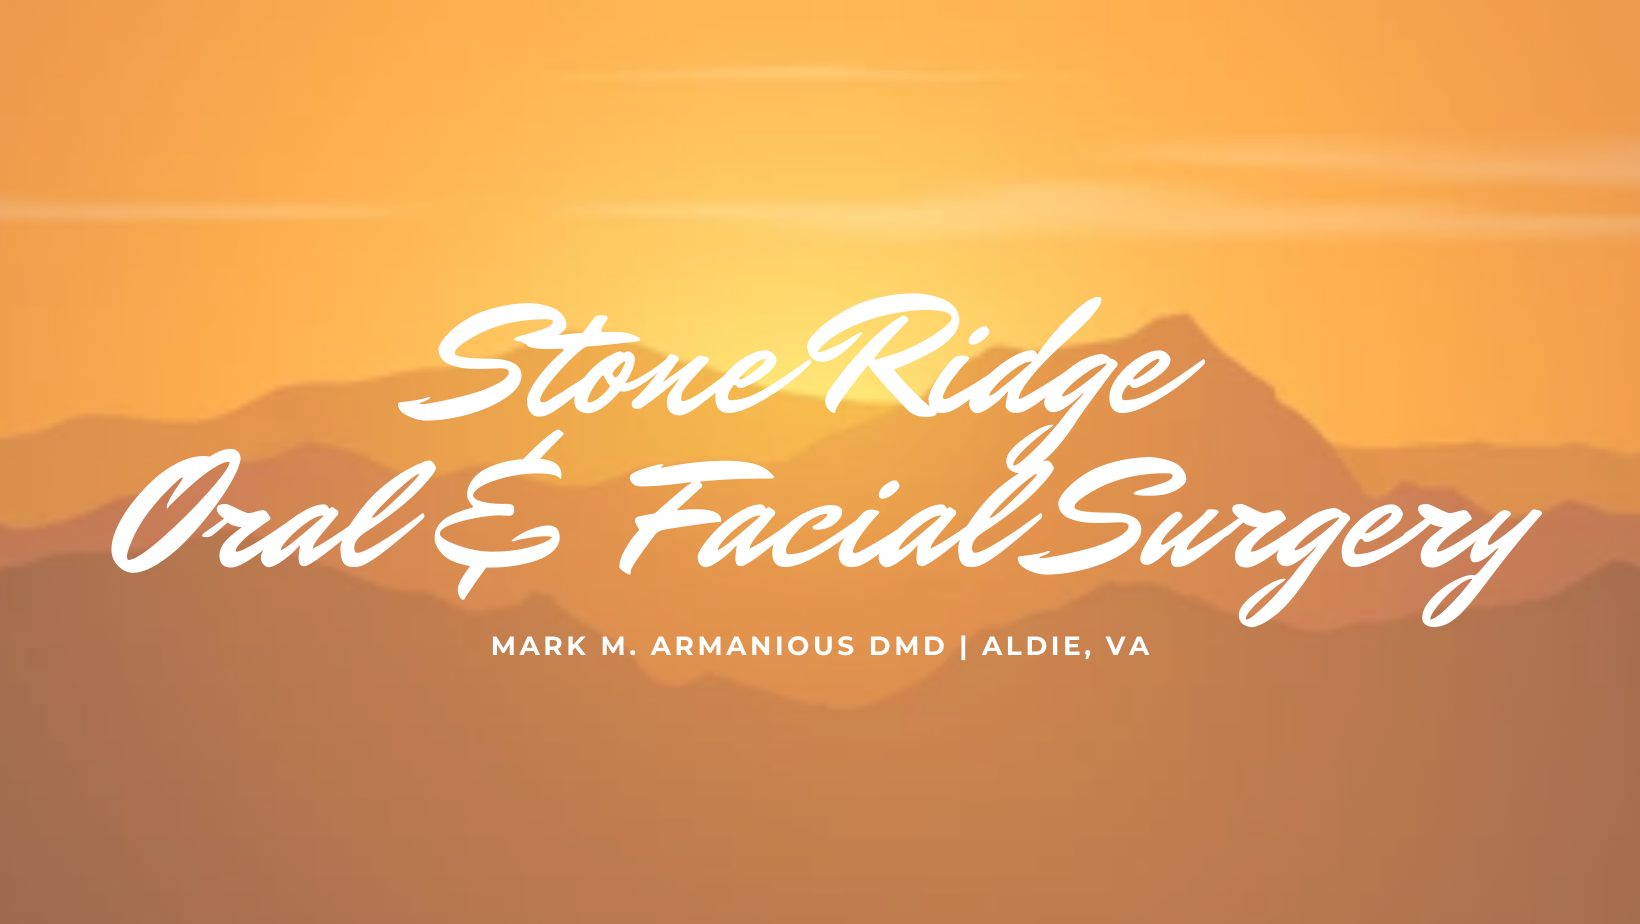 Stone Ridge Oral Surgery reviews | Oral Surgeons at 24600 Millstream Dr. - Aldie VA